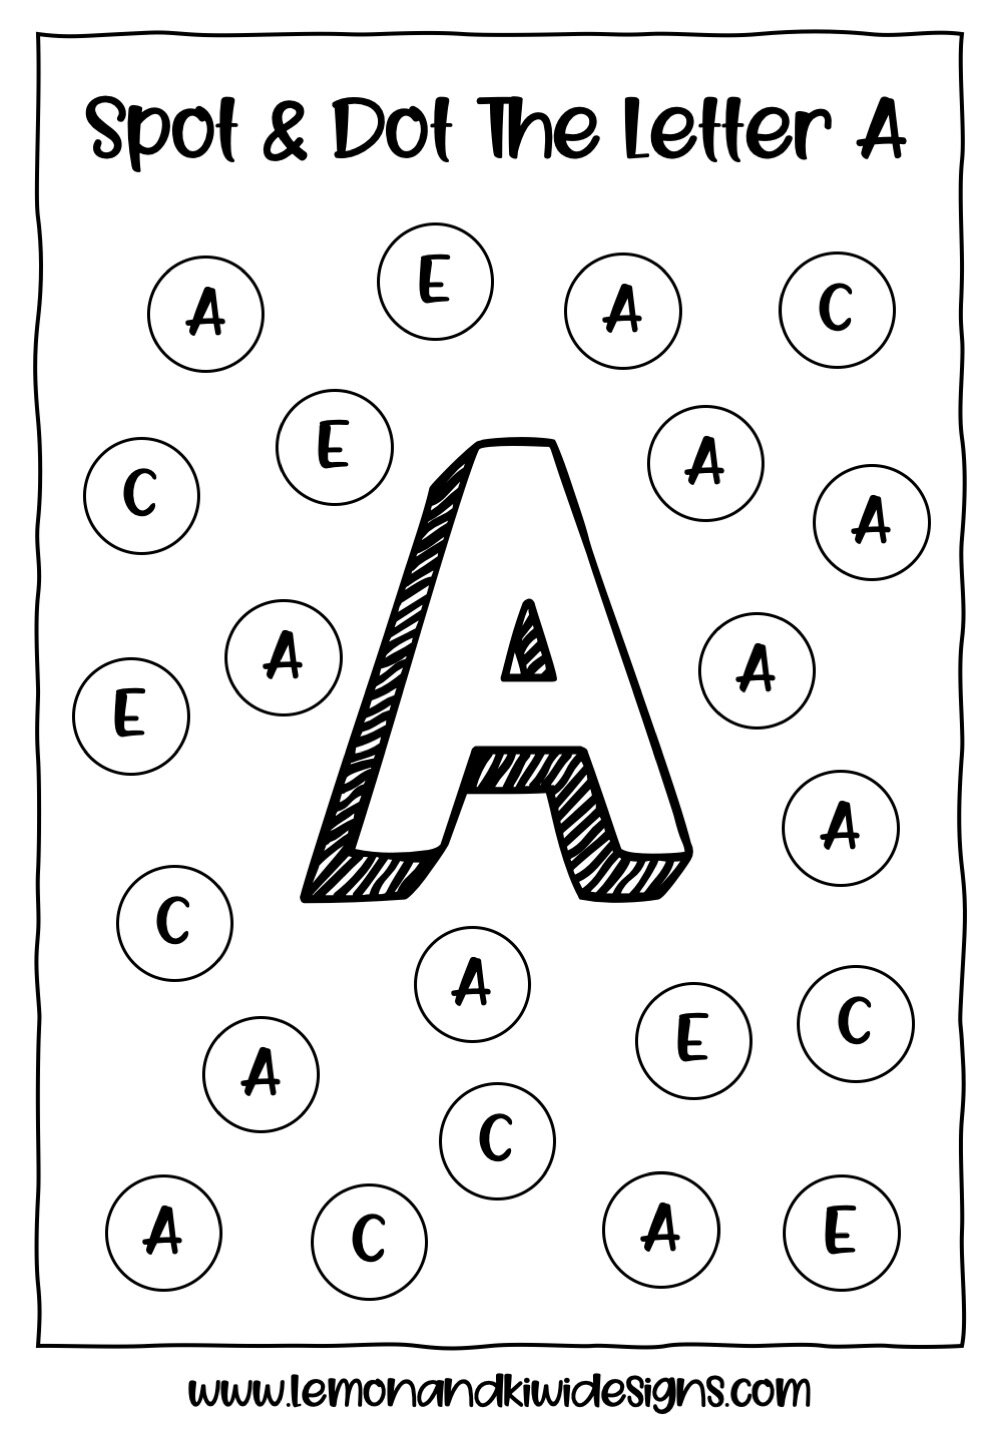 Alphabet Spot And Dot Free Do A Dot Printables Lemon Kiwi Designs